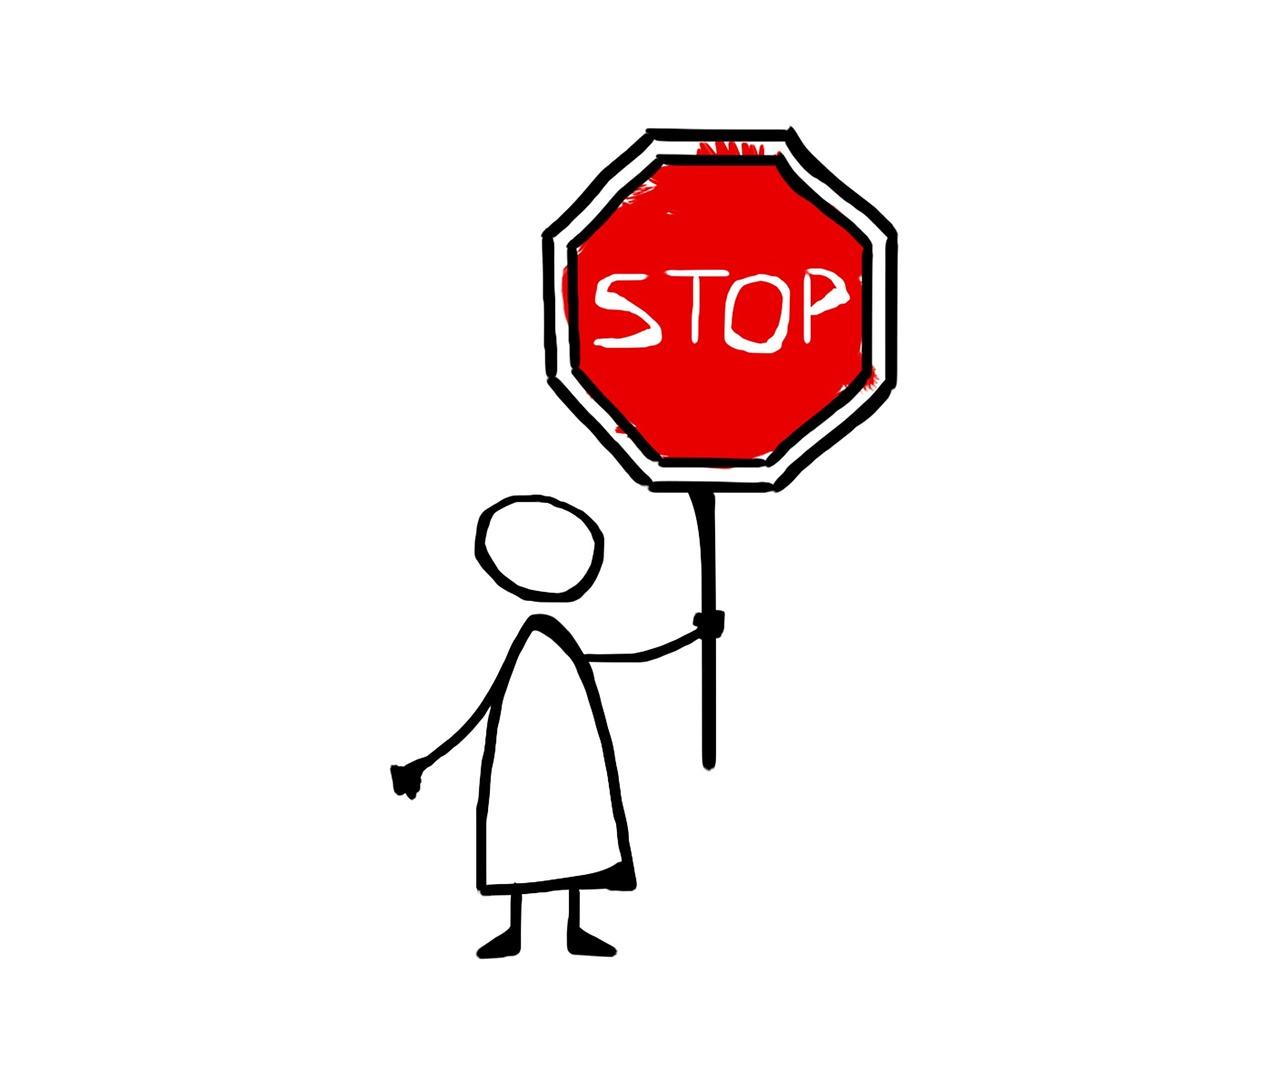 Children_need_privacy_too.jpg